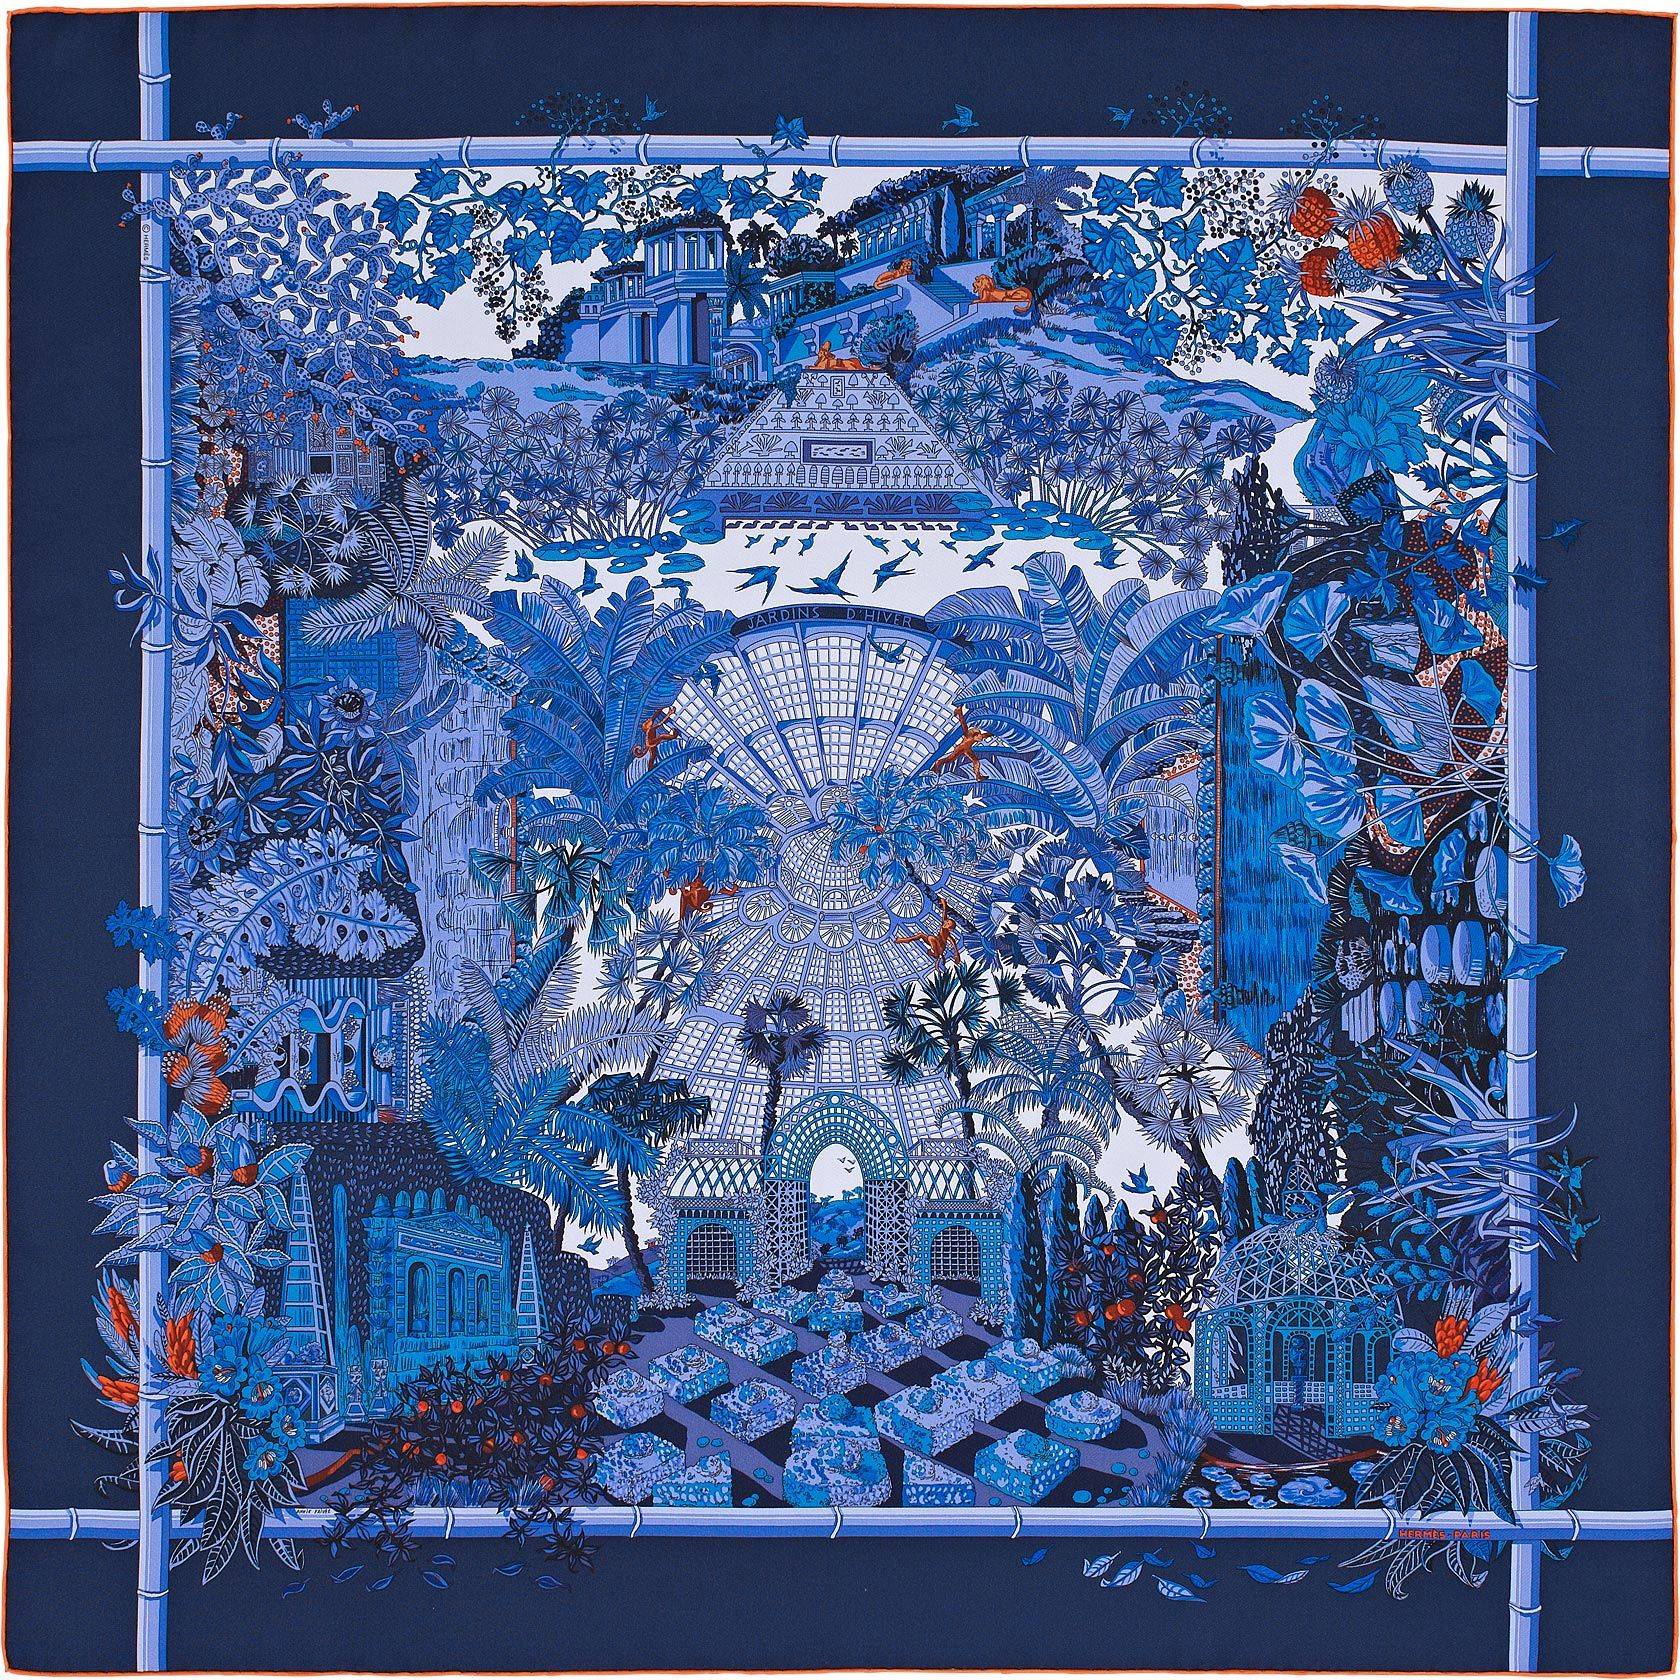 36 x 36 scarf herm s jardins d 39 hiver silk painting. Black Bedroom Furniture Sets. Home Design Ideas